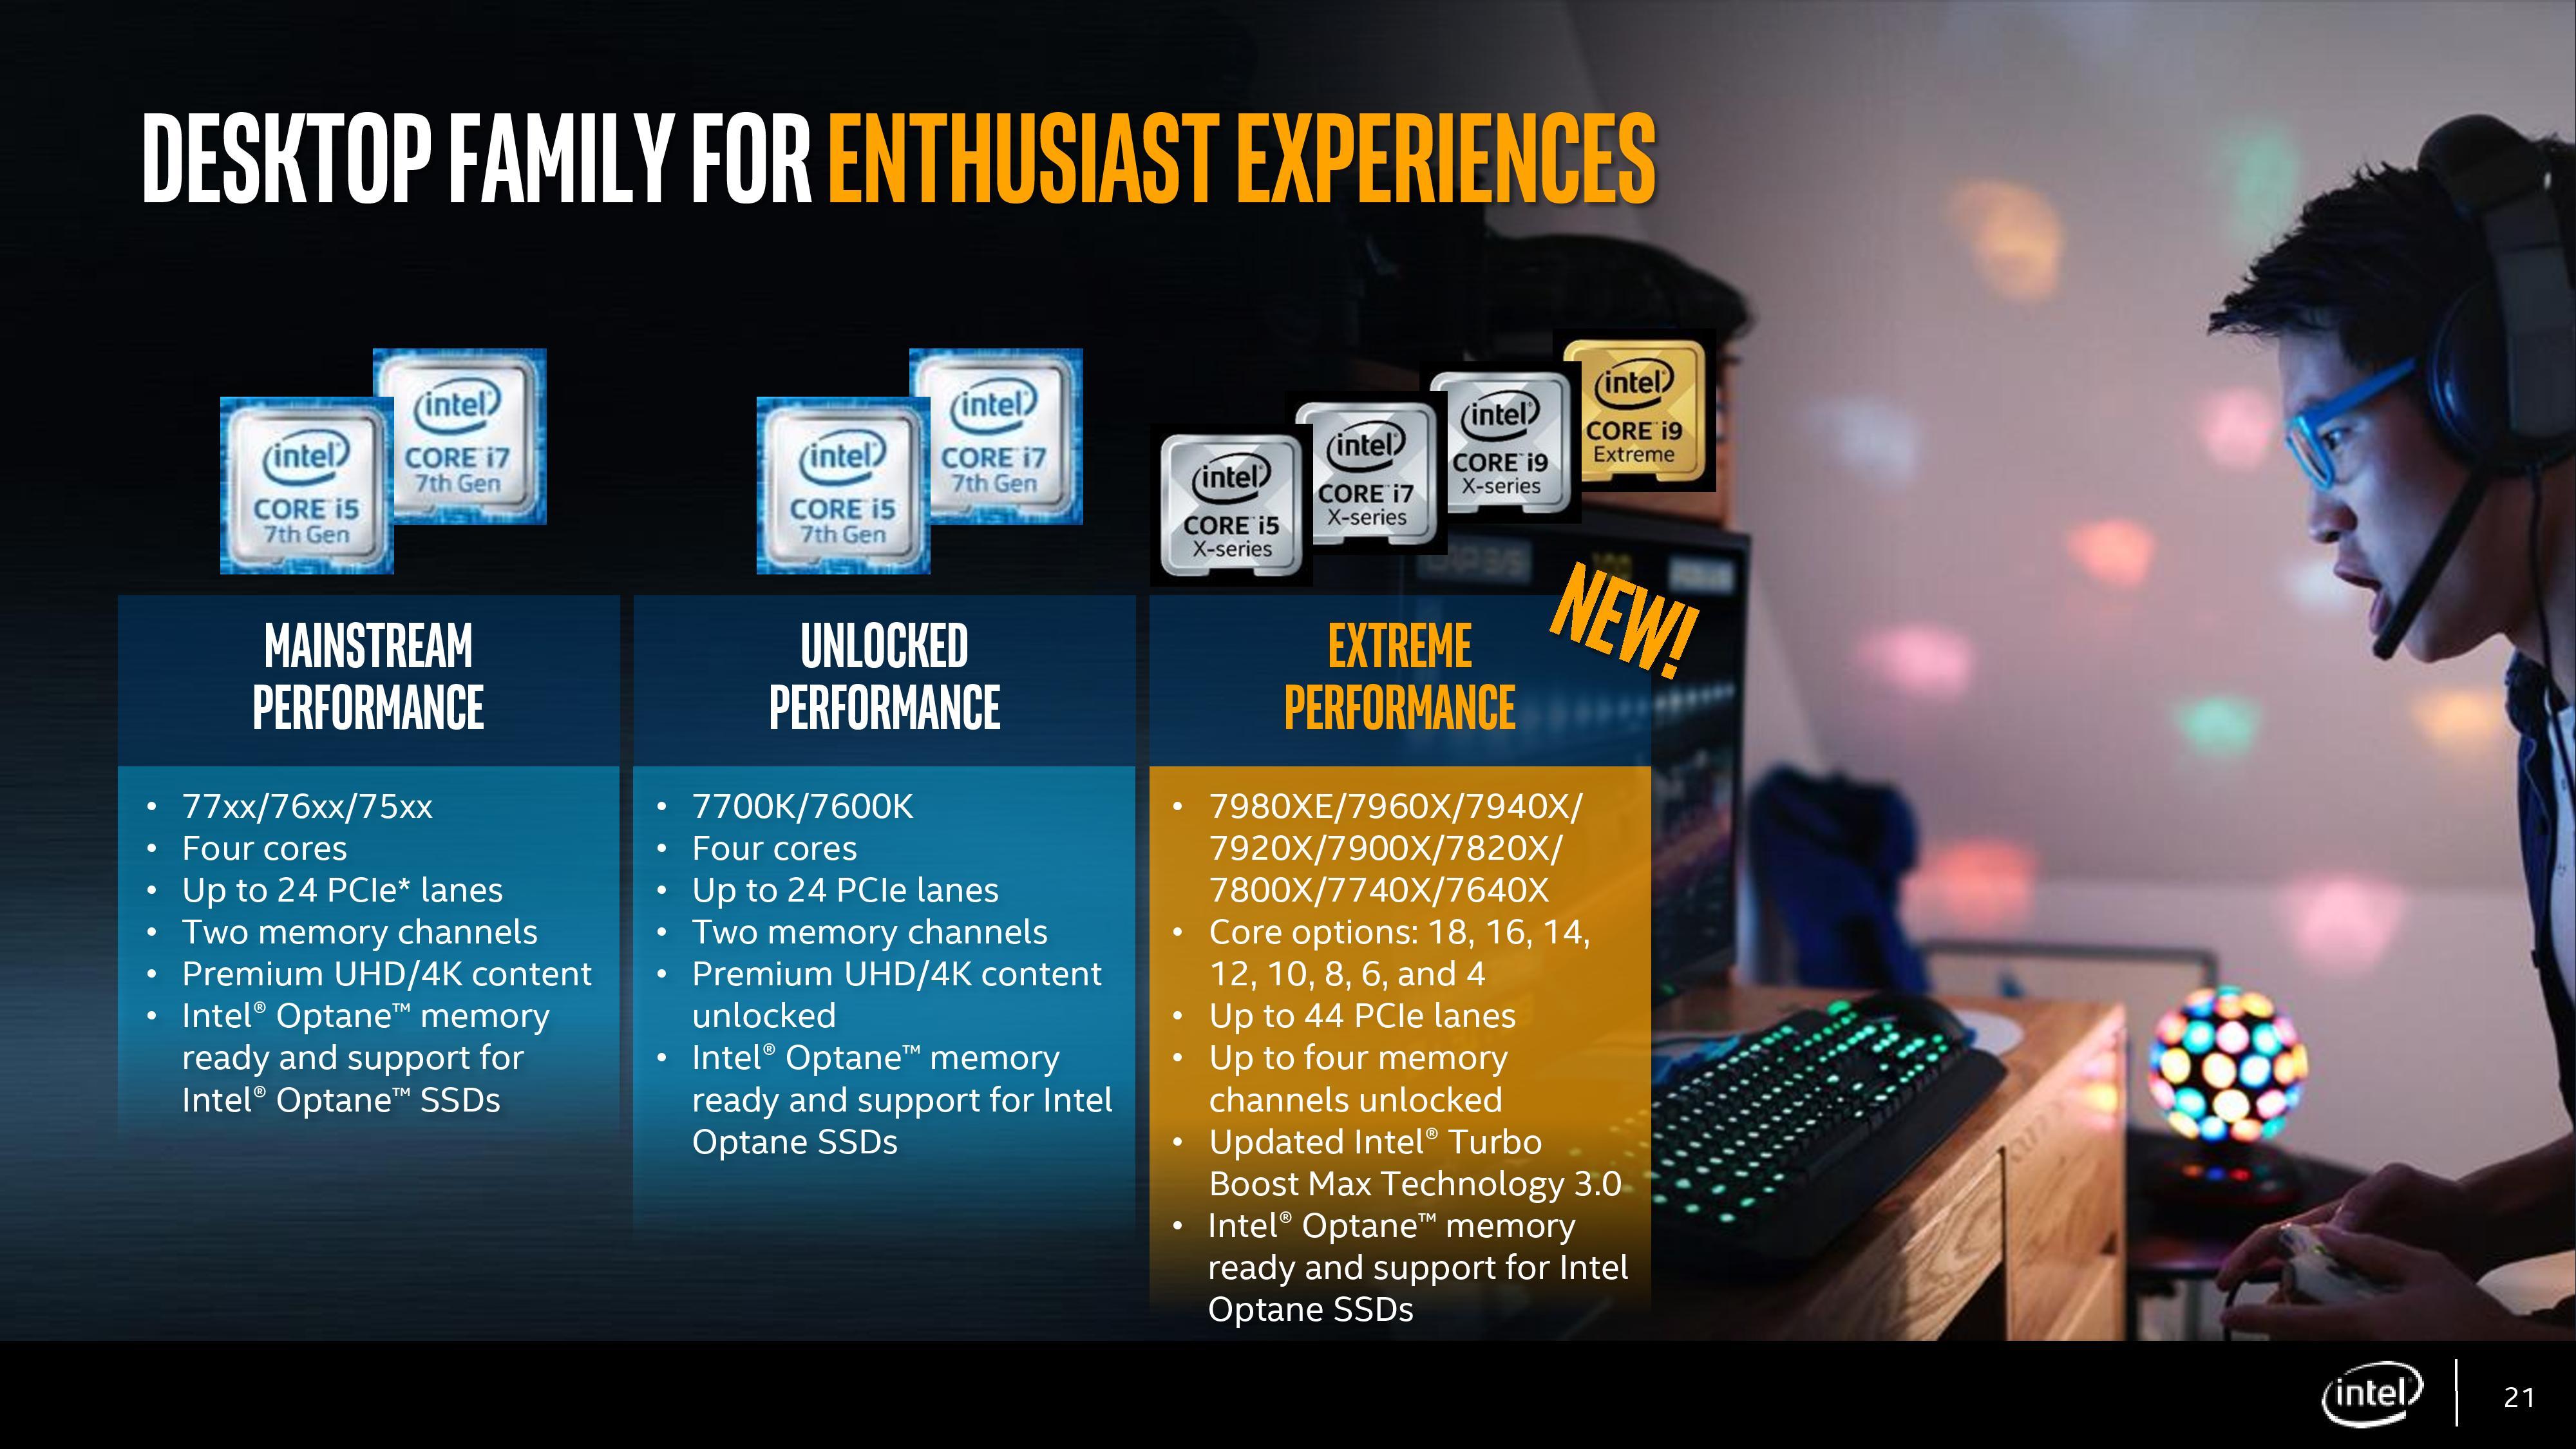 Intel Core X Series CPU performance